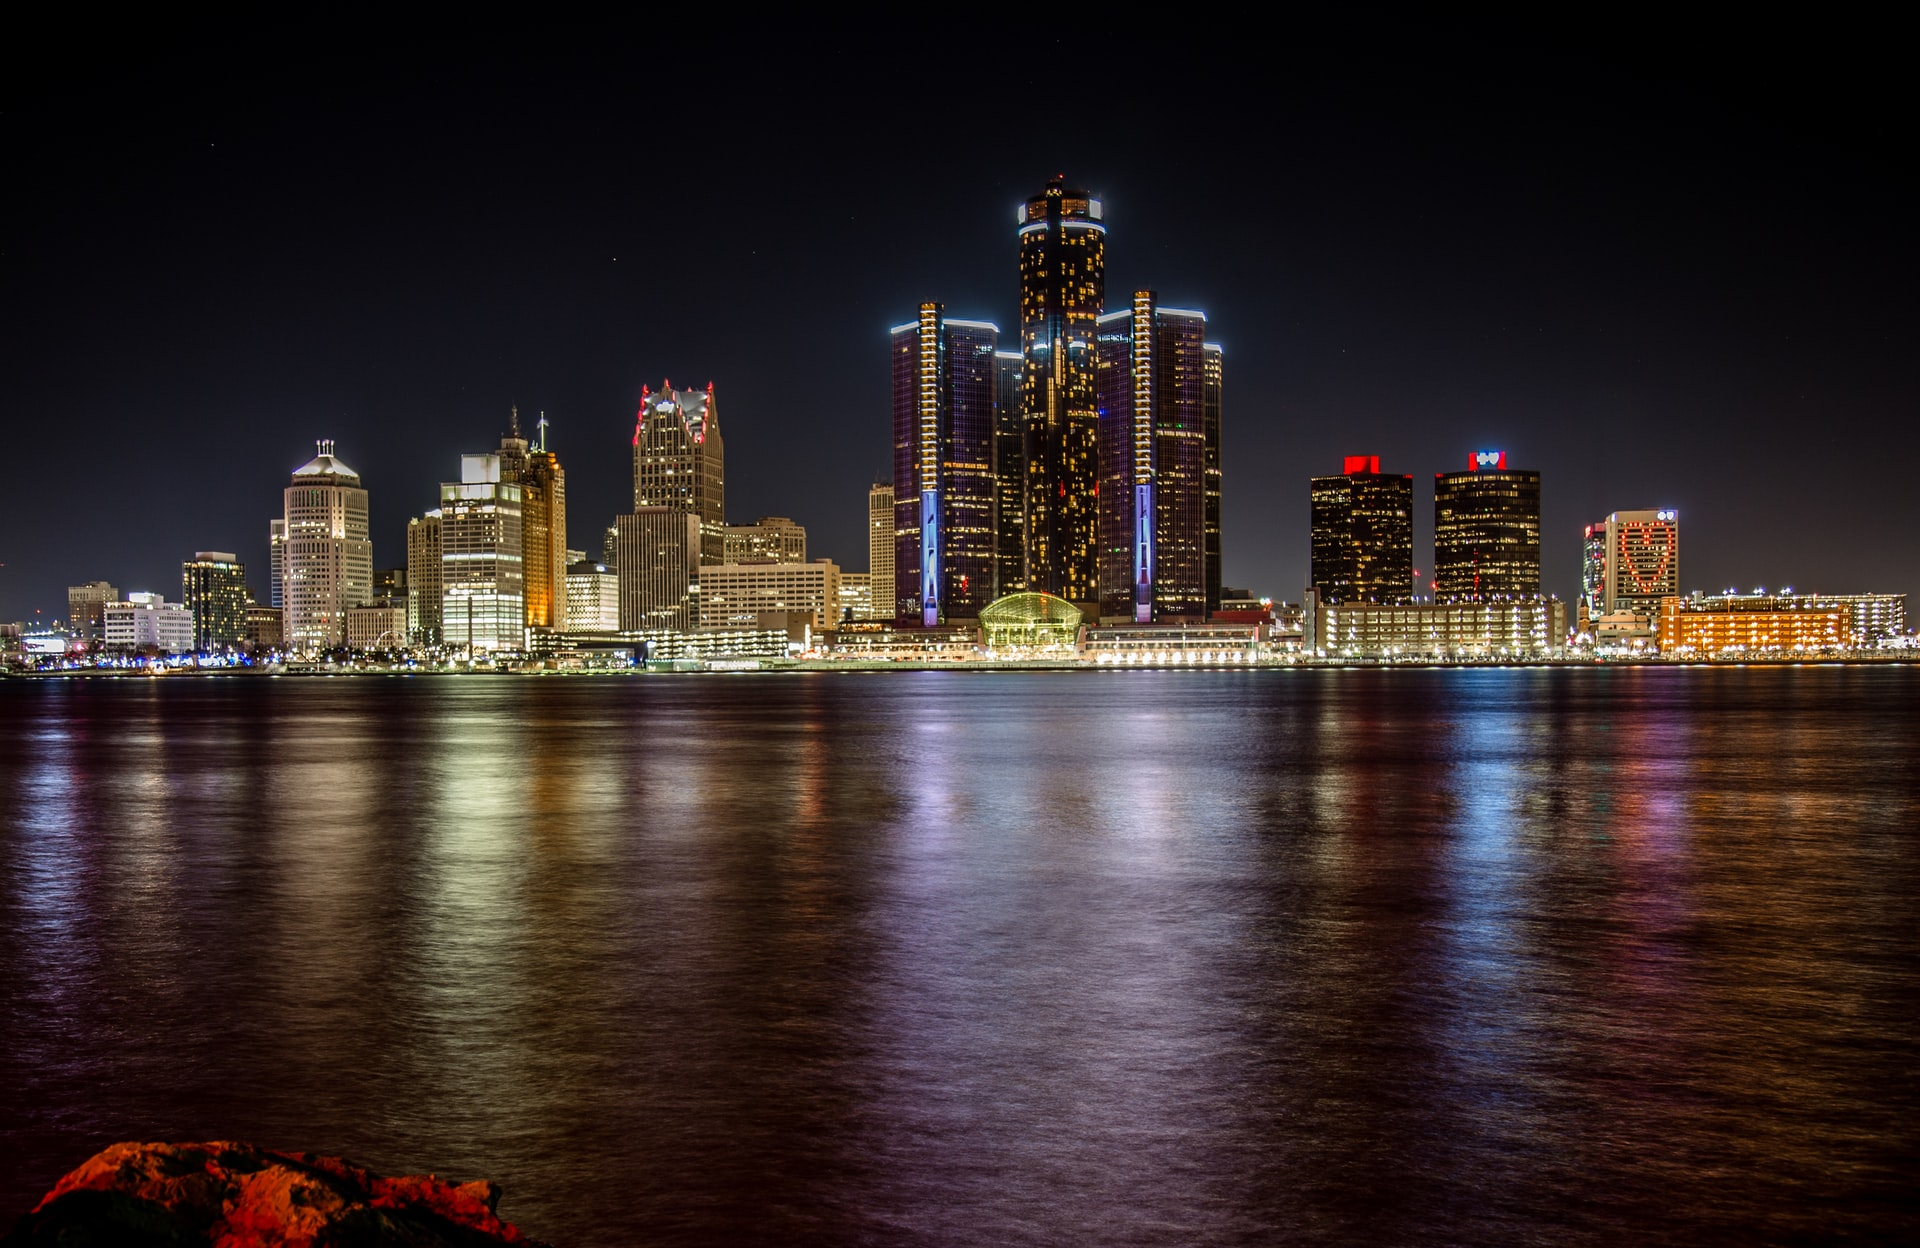 Explore the Detroit International RiverWalk